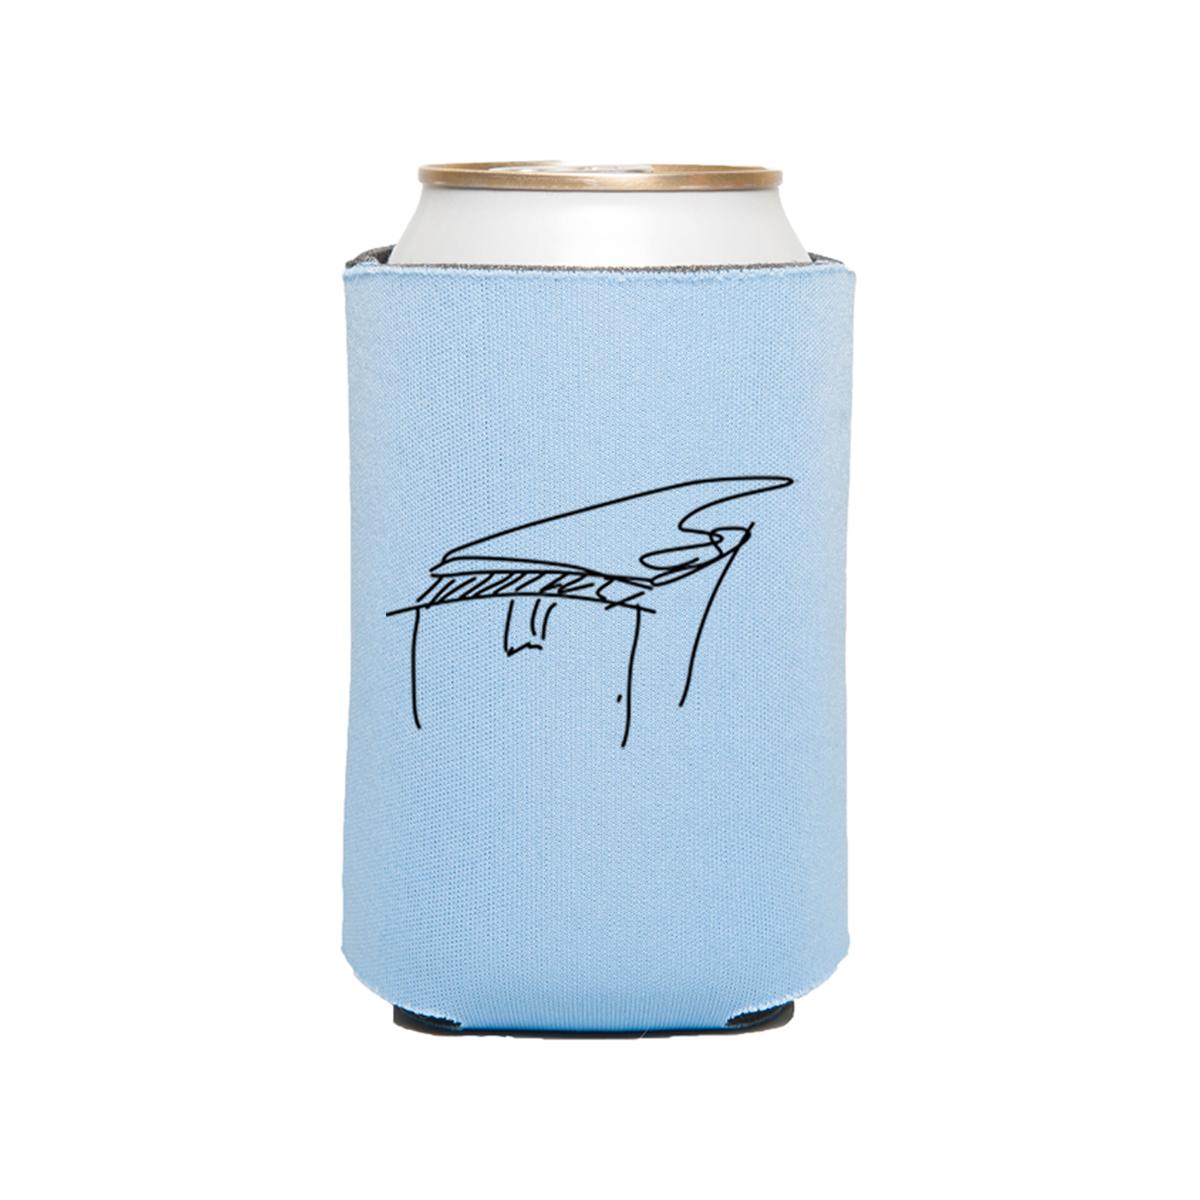 Piano Sketch Koozie